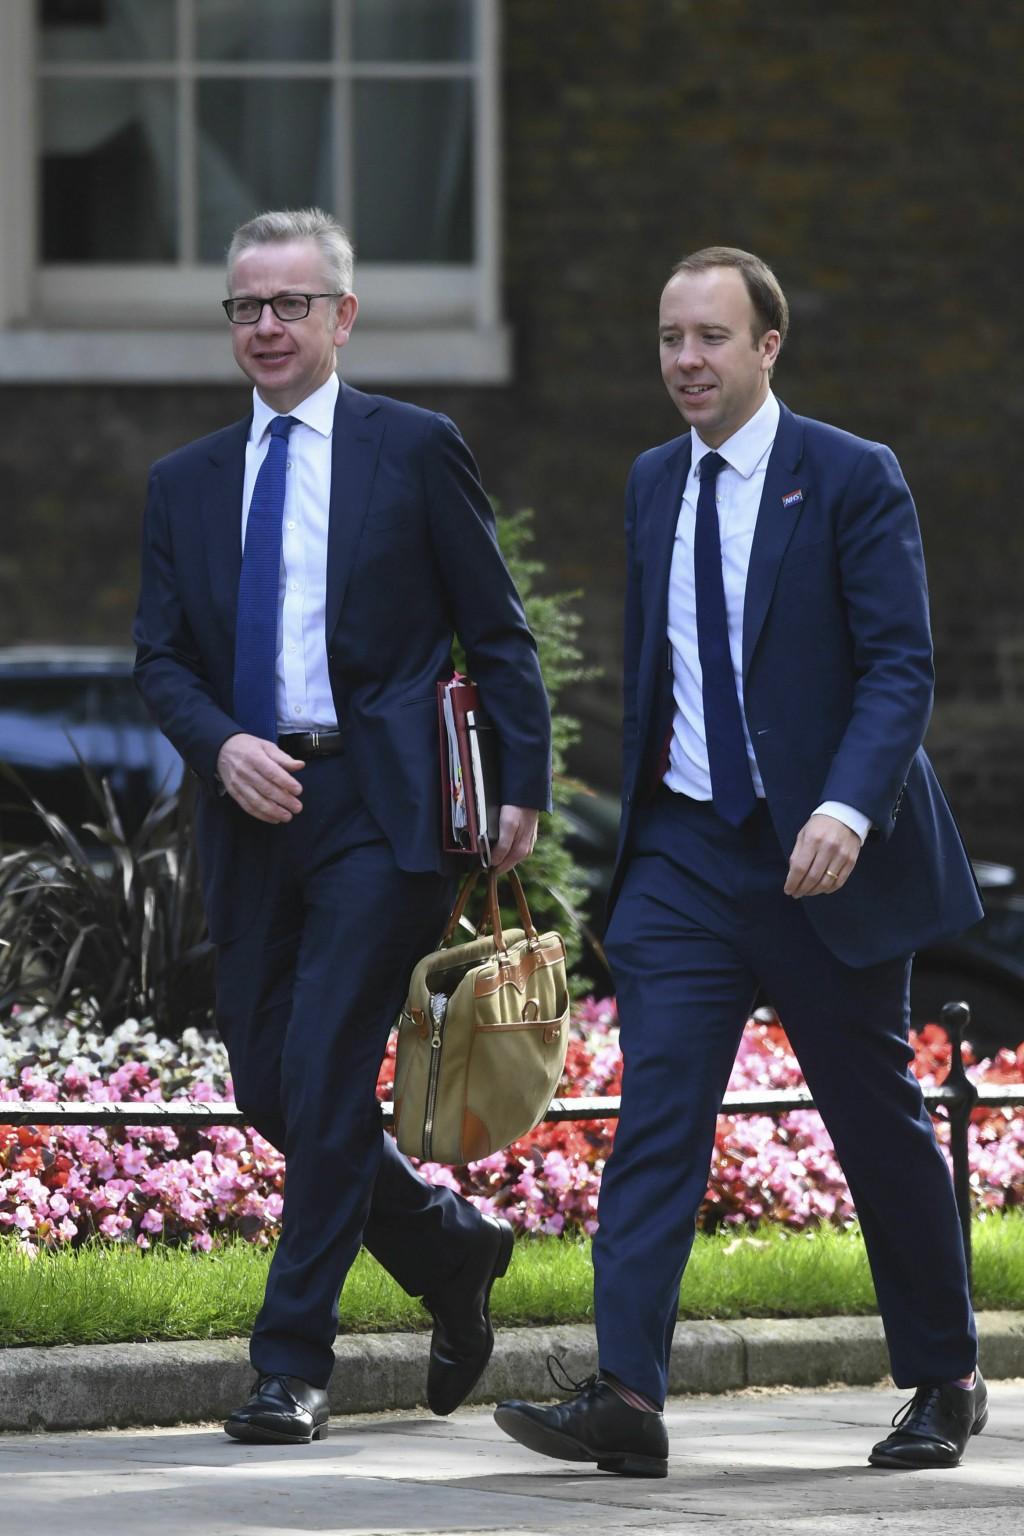 Britain's Environment Secretary Michael Gove, left, and Health Secretary Matt Hancock arrive for a cabinet meeting at 10 Downing Street, London, Tuesd...